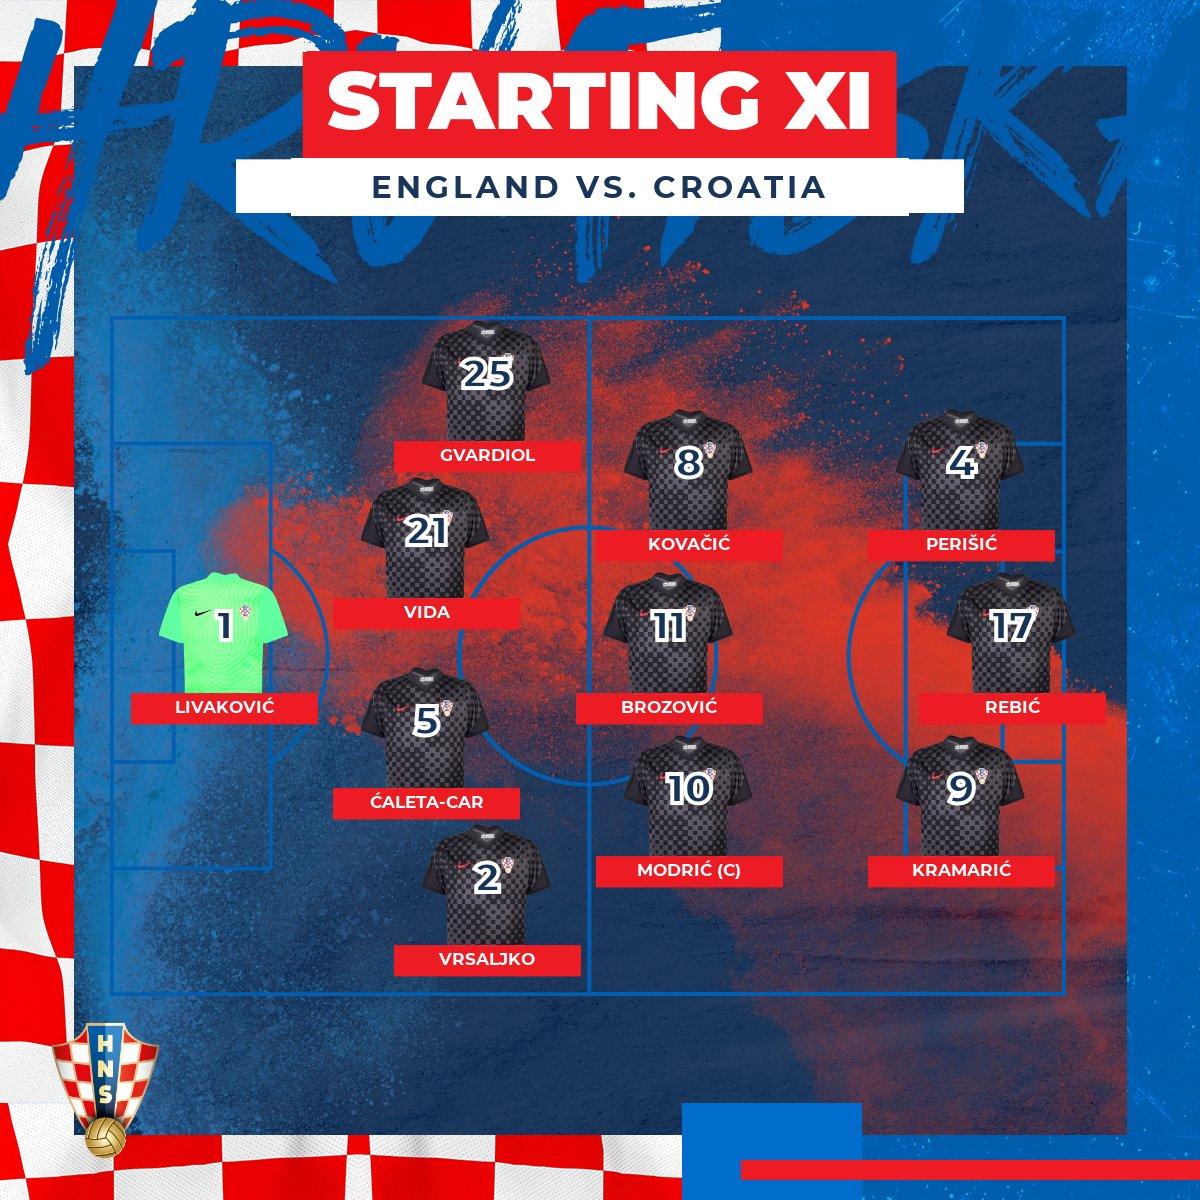 🔥 #CRO starting lineup! 🔥  #BeProud #EURO2020 #ENGCRO #Family #Vatreni https://t.co/tyhZrxuXRu